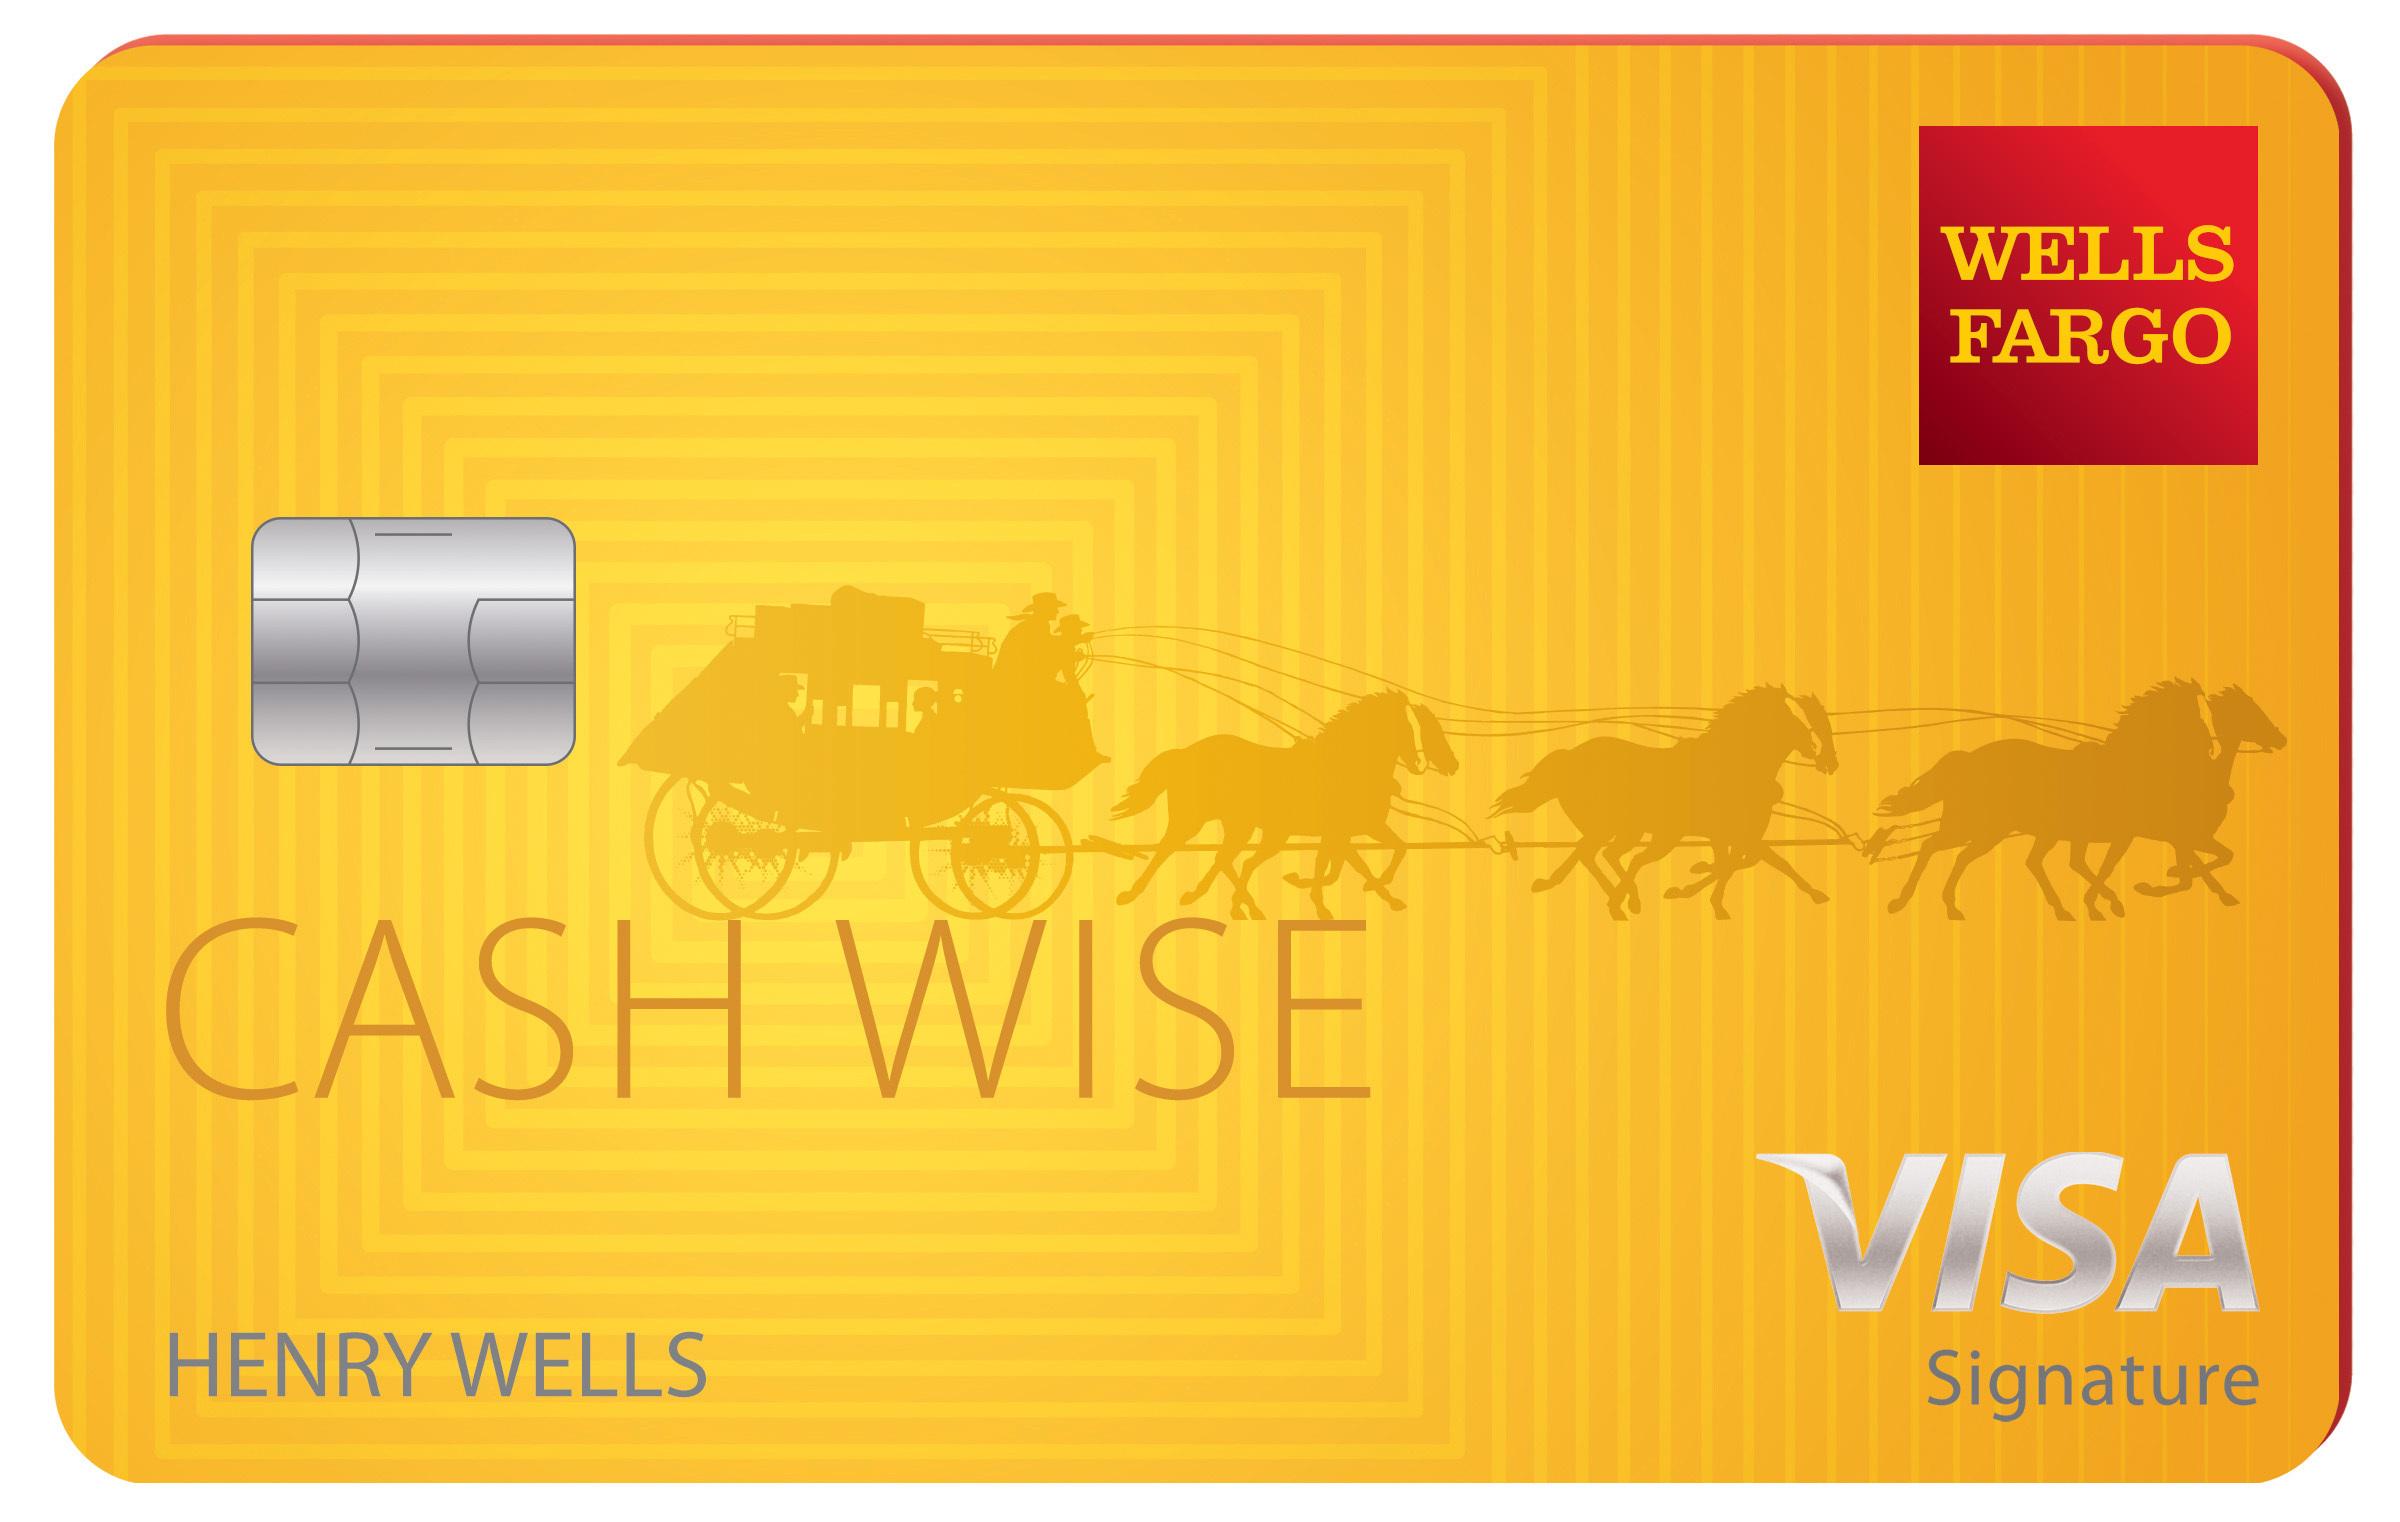 Wells-Fargo-Cash-Wise-Visa-Card